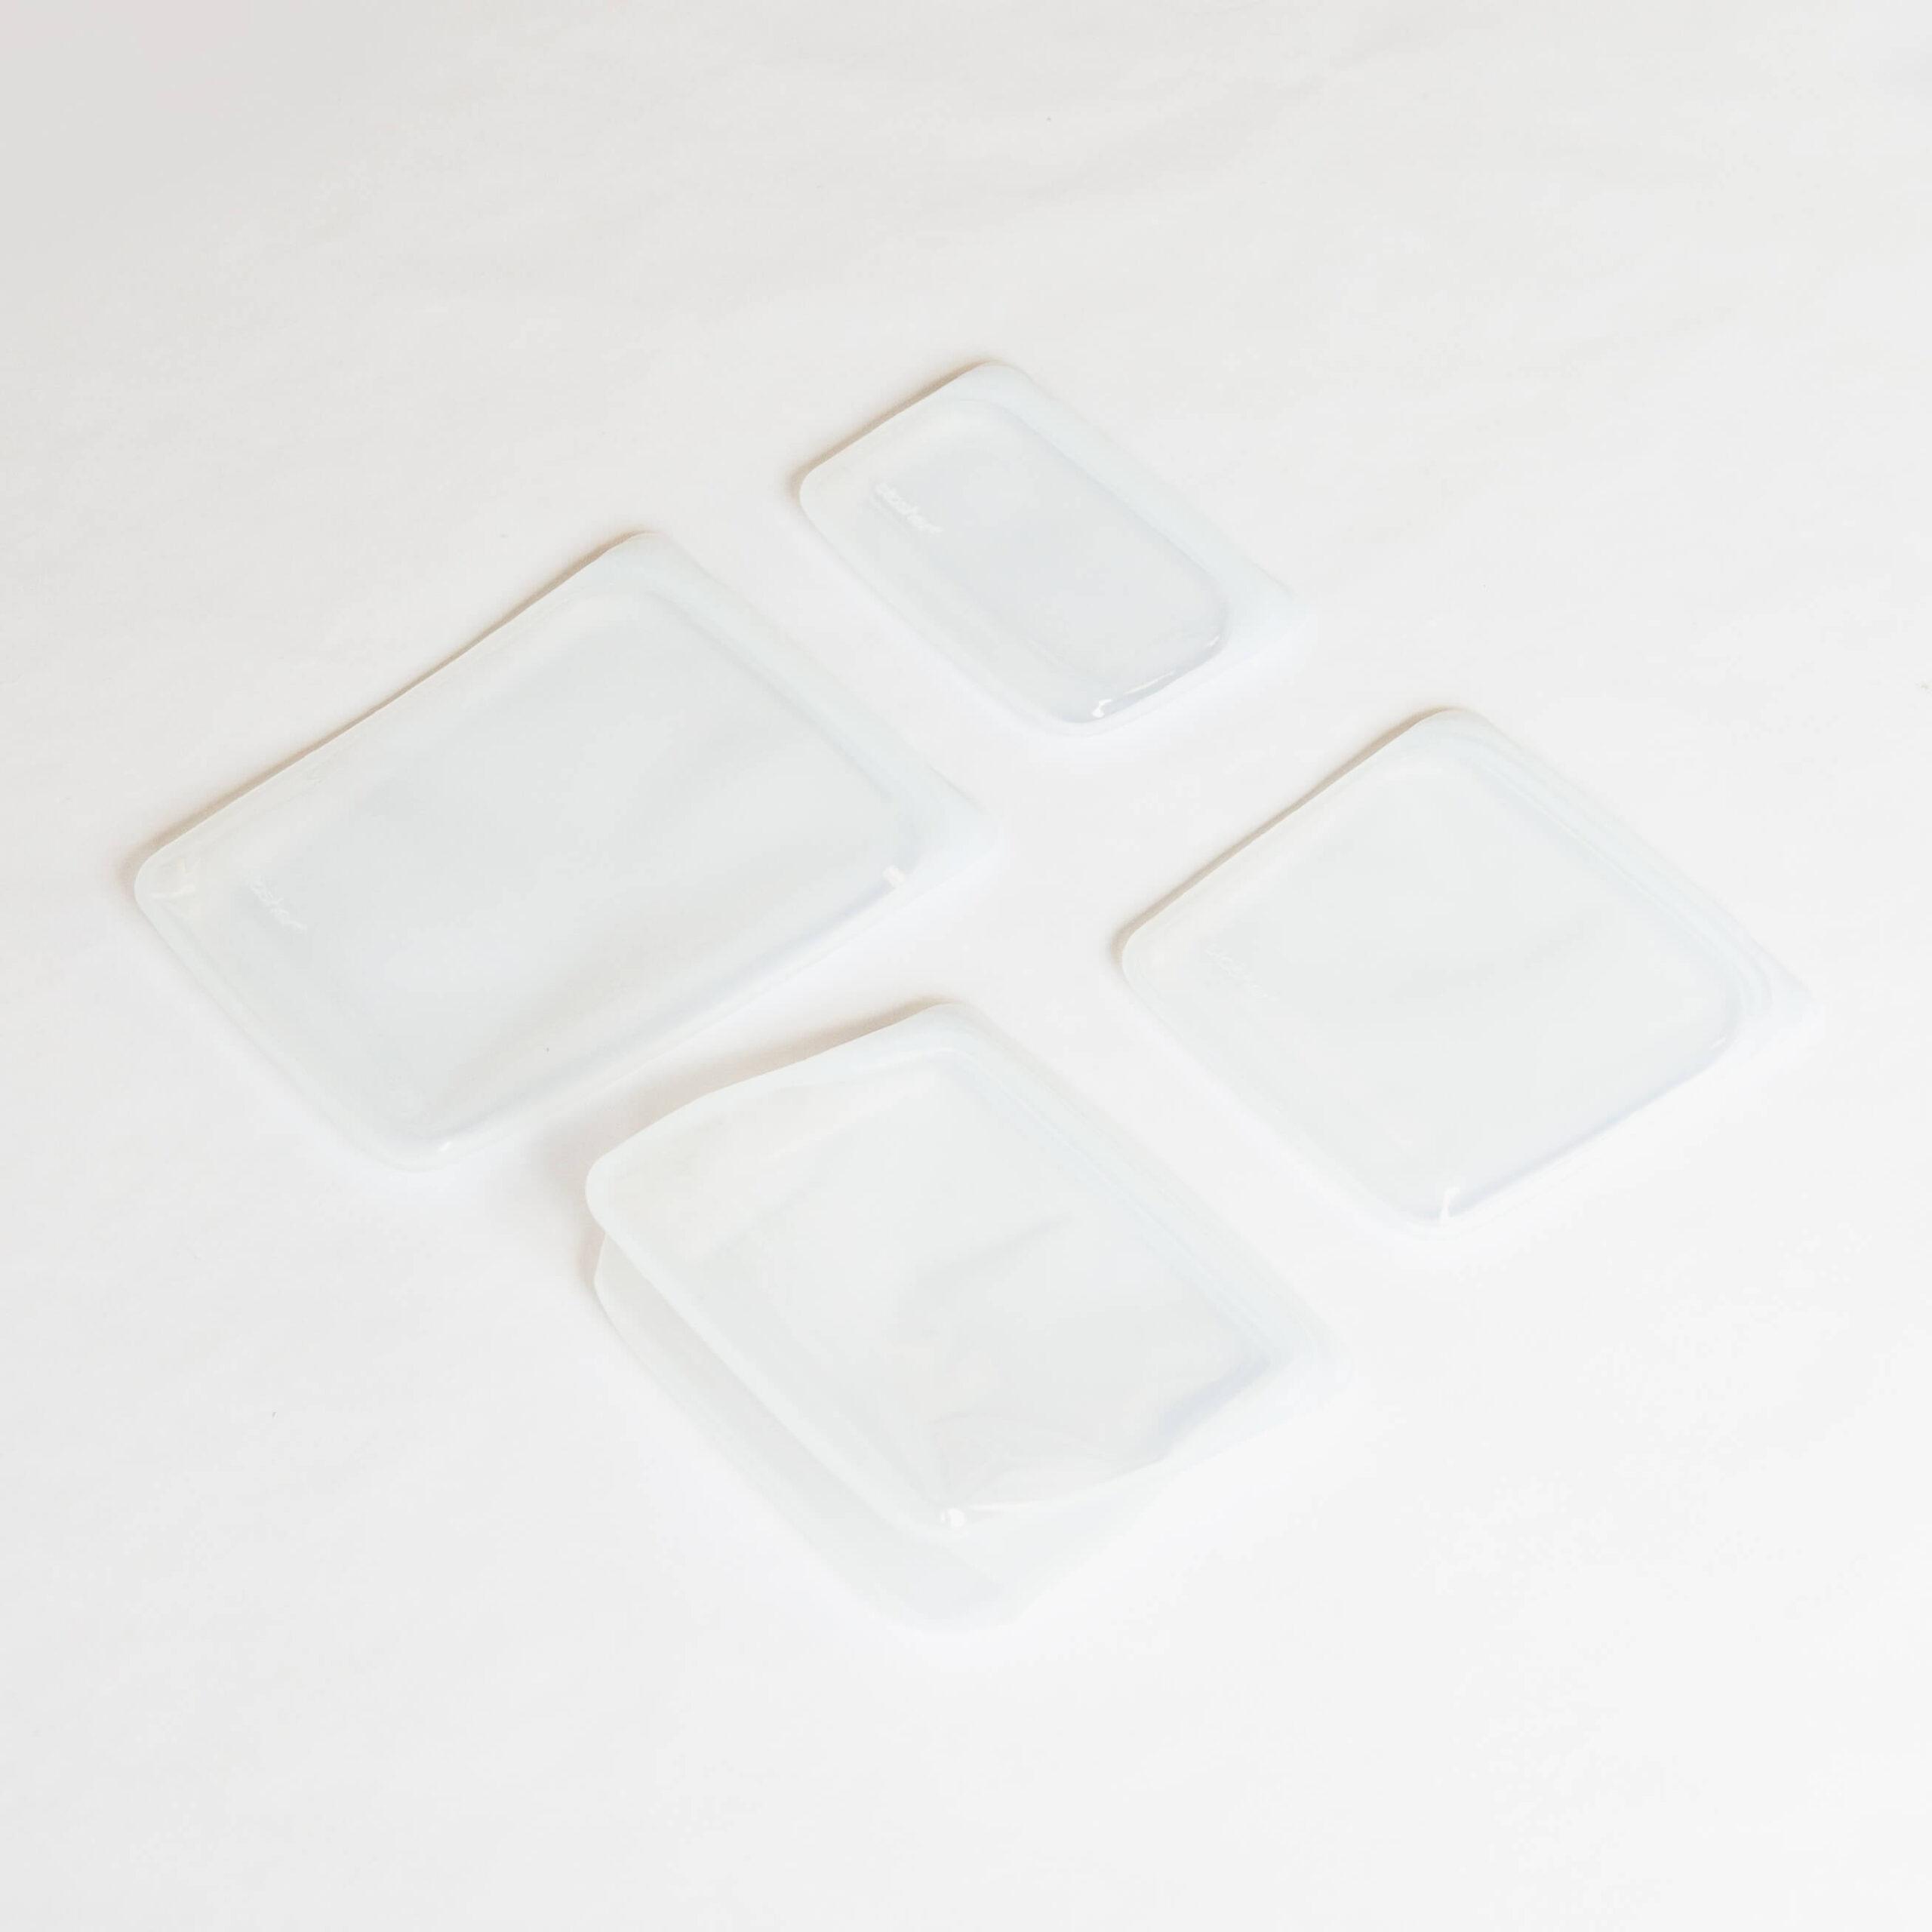 Stasher Bag Bundle Clear